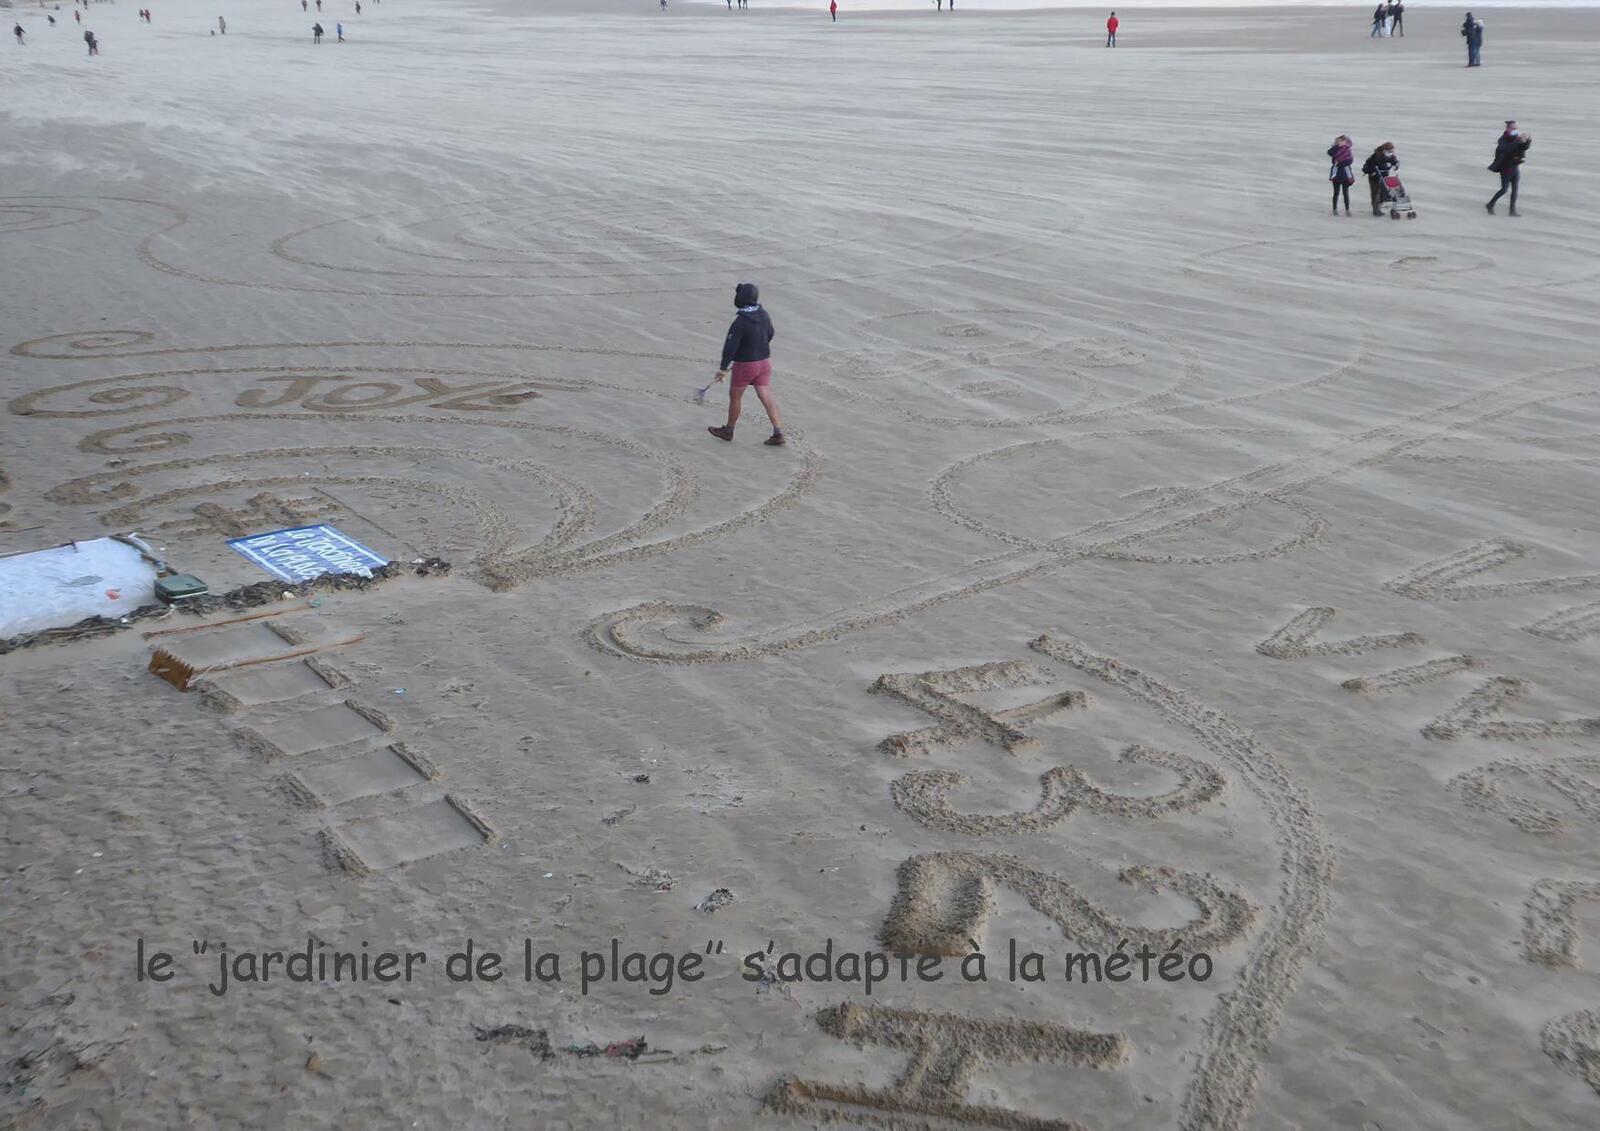 Le jardinier de la plage : vent